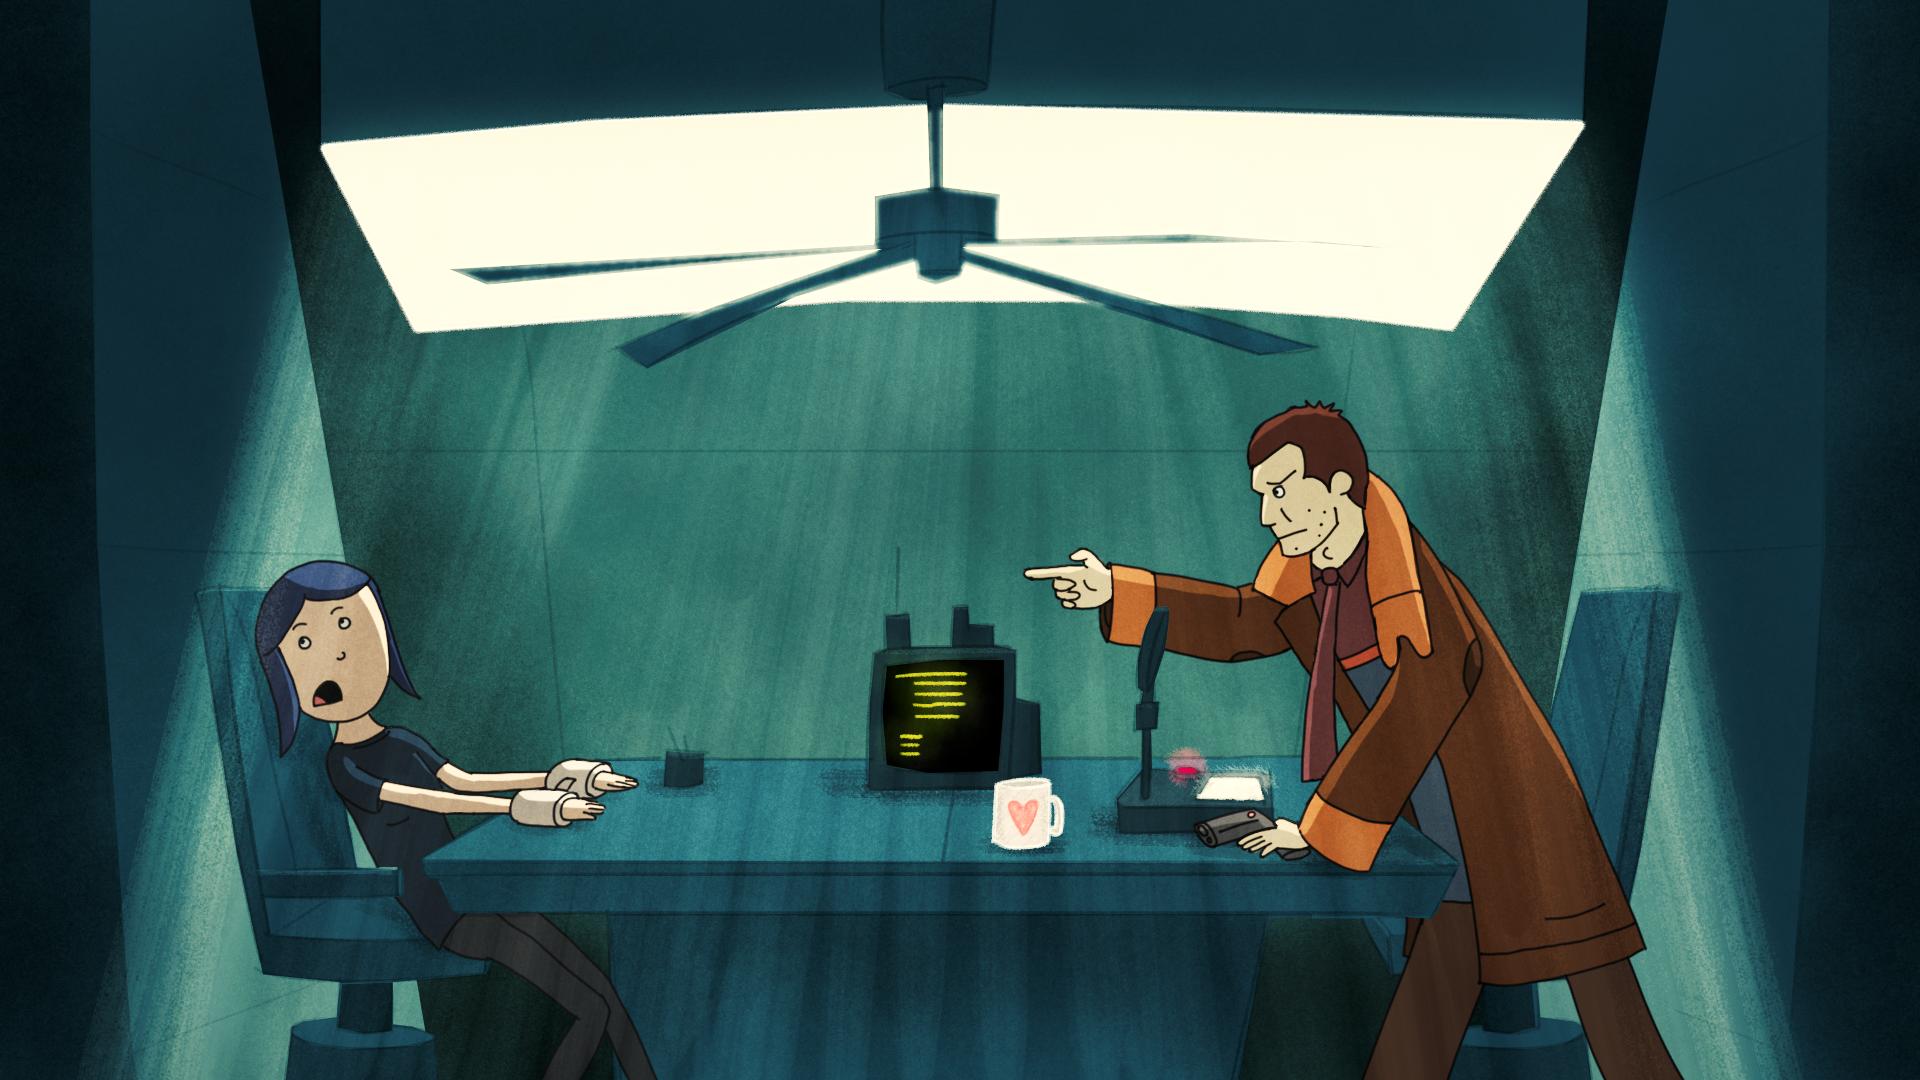 interrogation-room-new